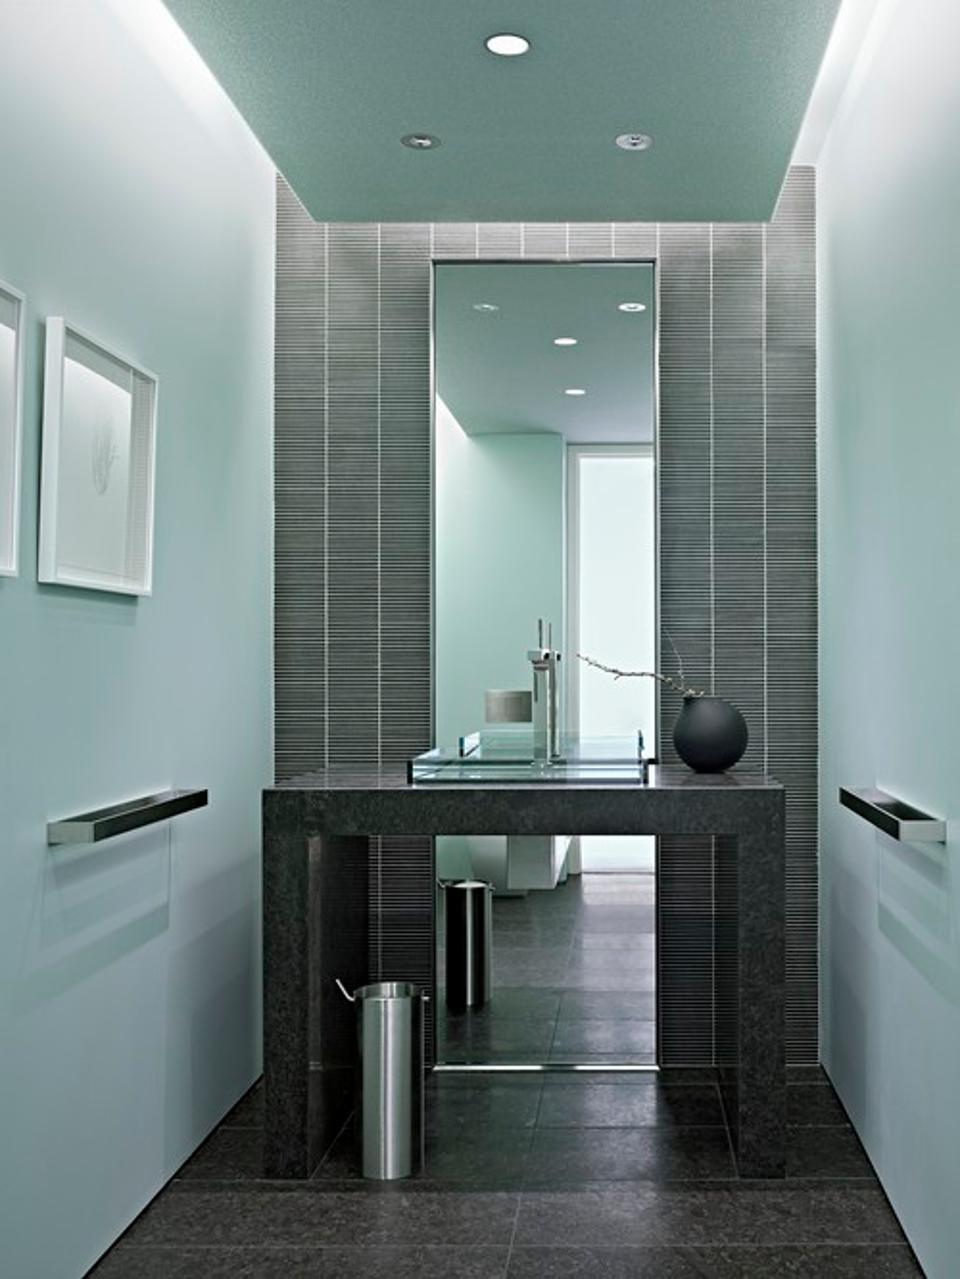 Chic & Stylish Powder Rooms Ideas for Your Bathroom modern powder room